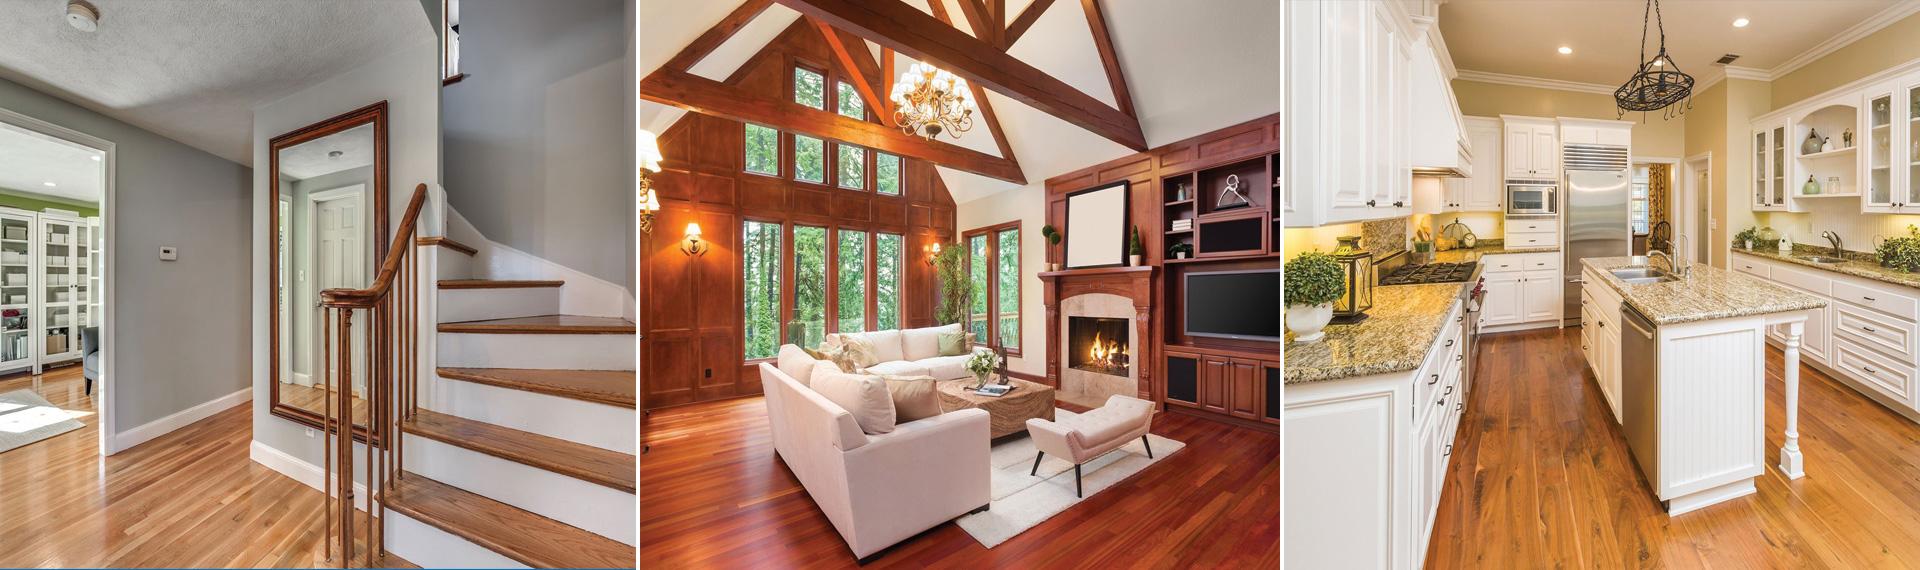 Renew Flooring & Home Improvement LLC Lyndhurst OH